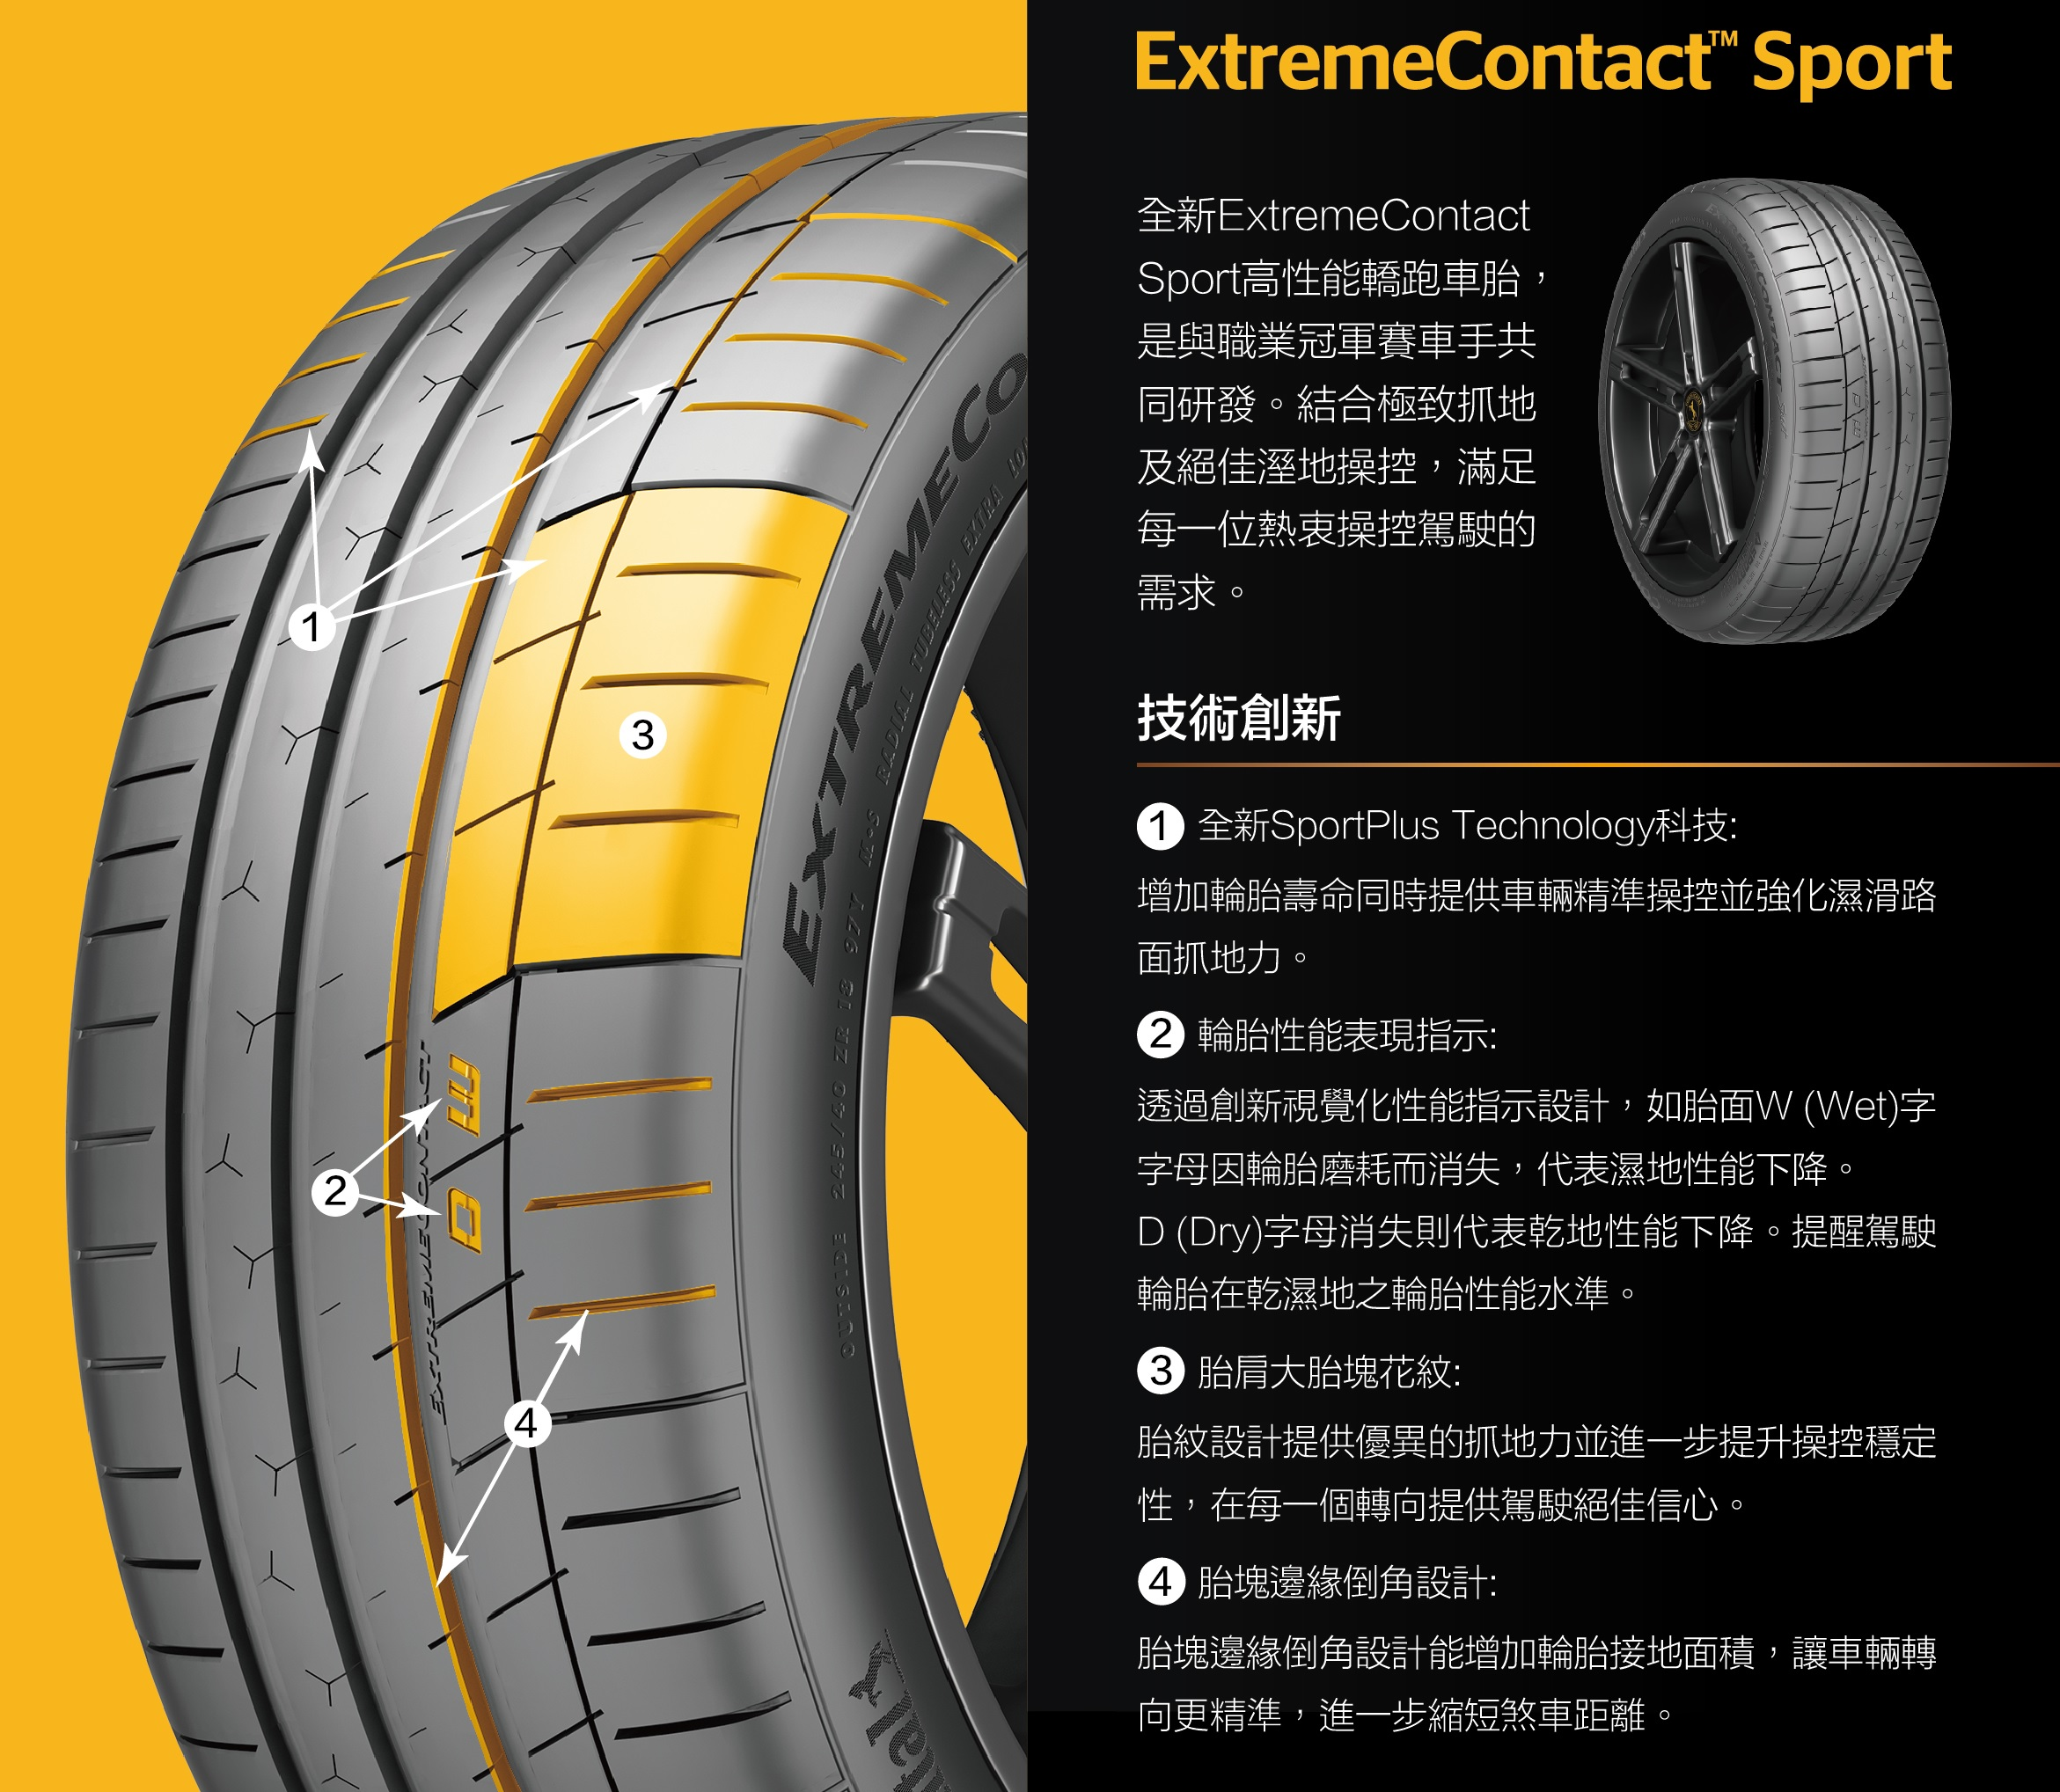 ExtremeContact Sport四大技術創新.jpg